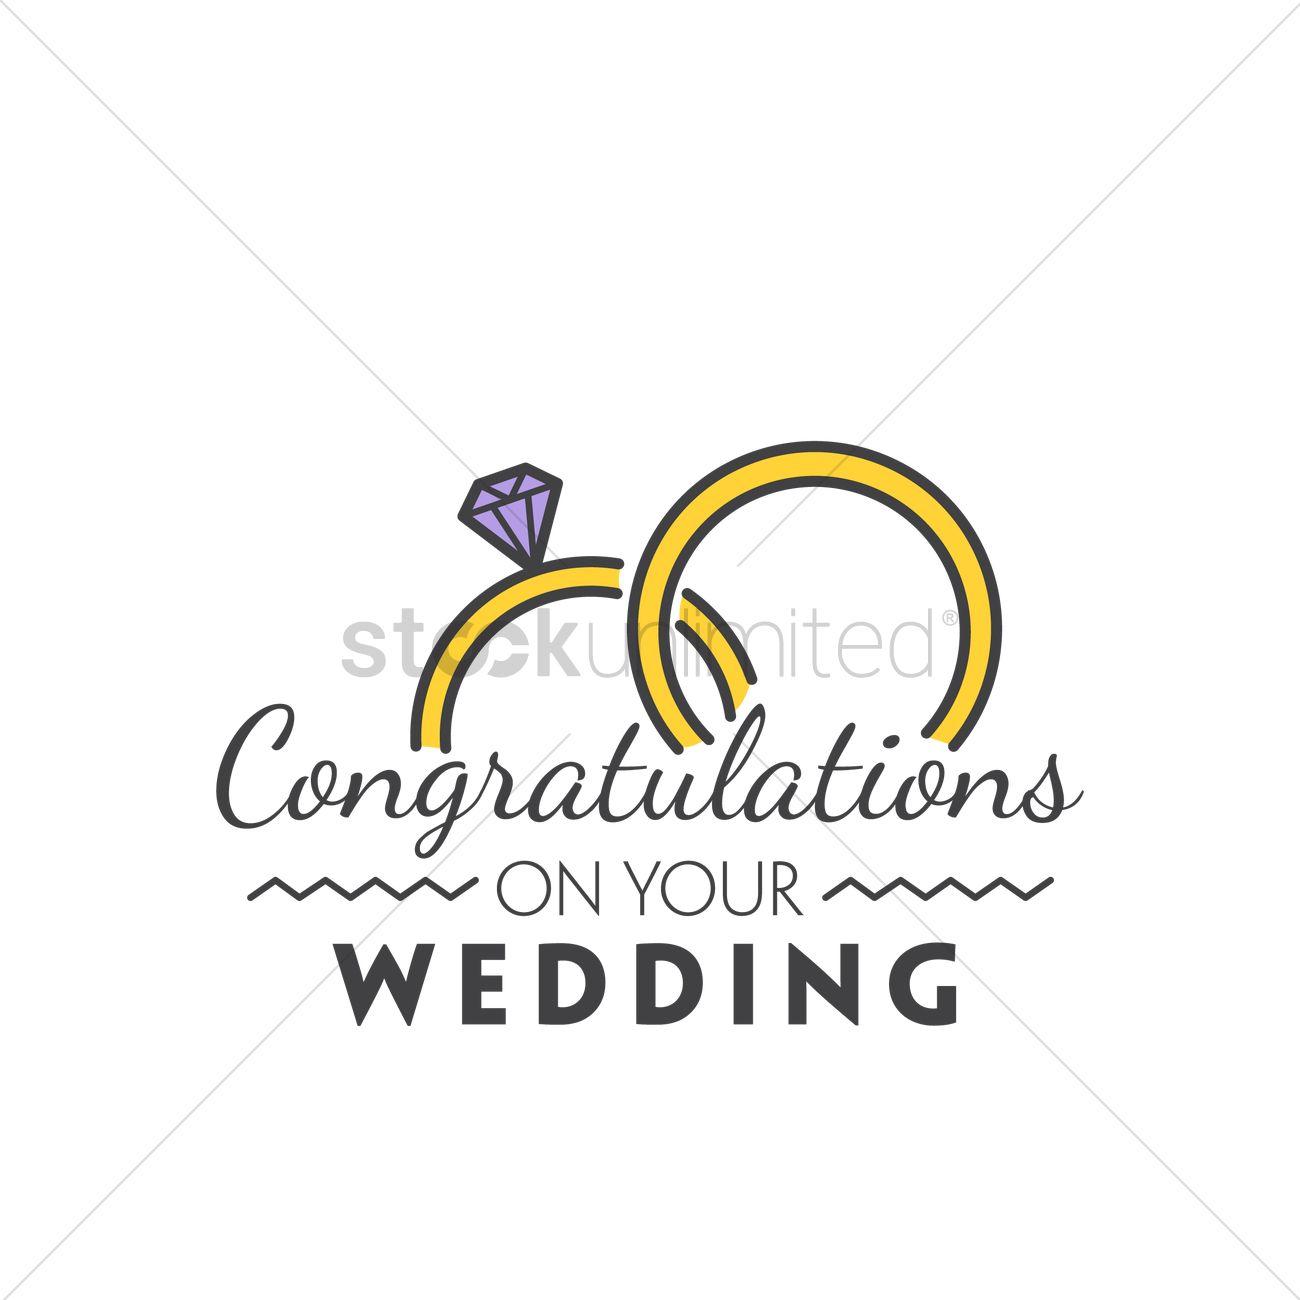 Congratulations On Your Wedding Vector Image 1791227